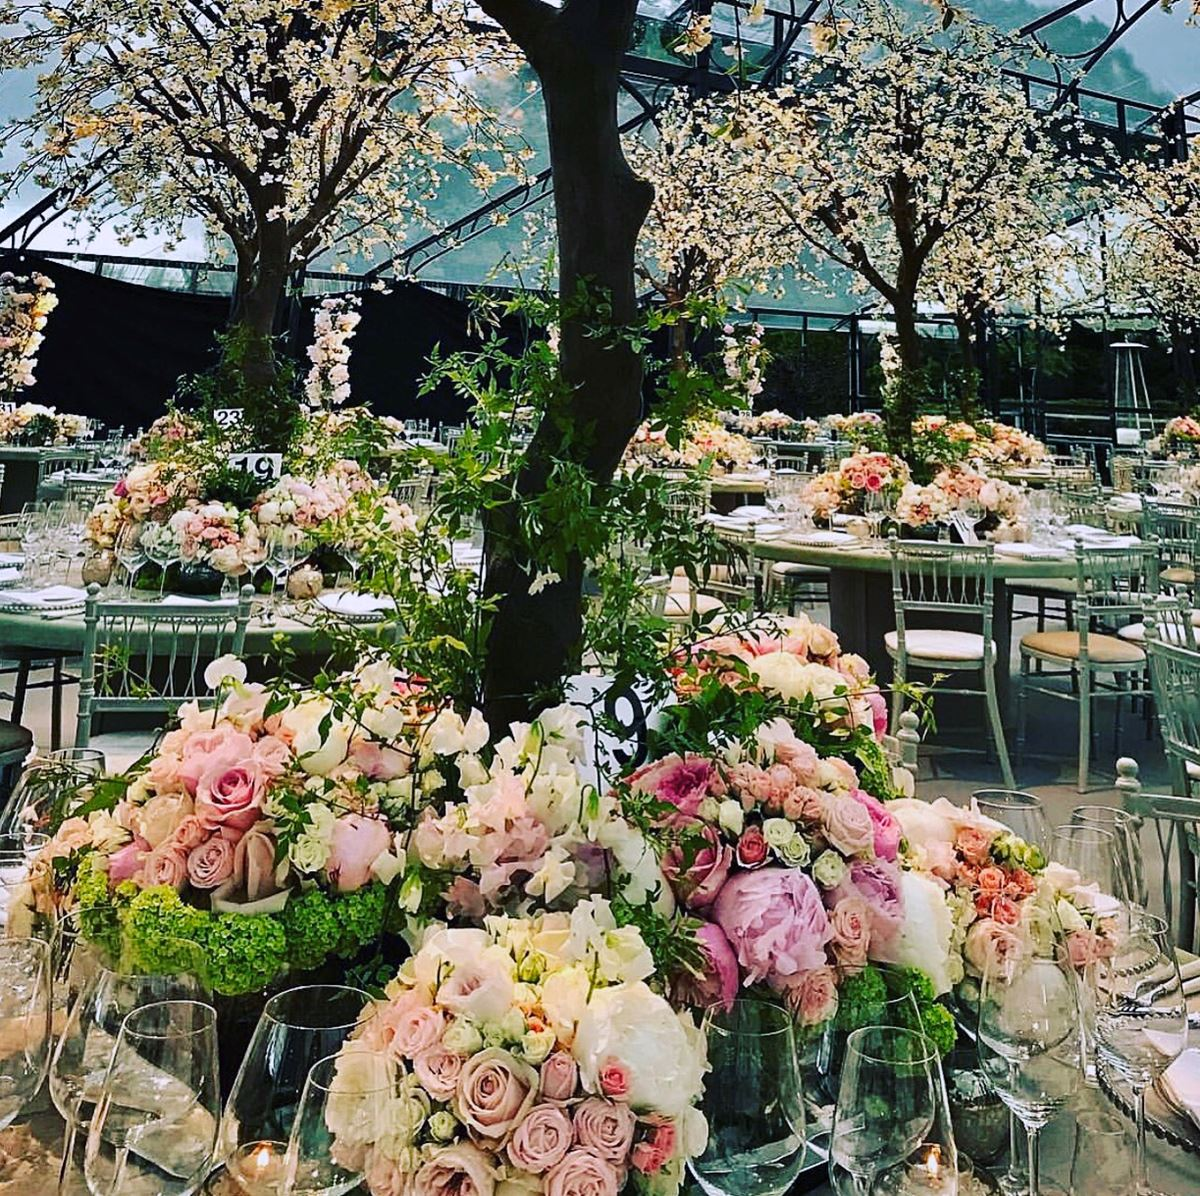 Celebrity Wedding Reception Decor: Inside Pippa Middleton's Floral Wedding Reception